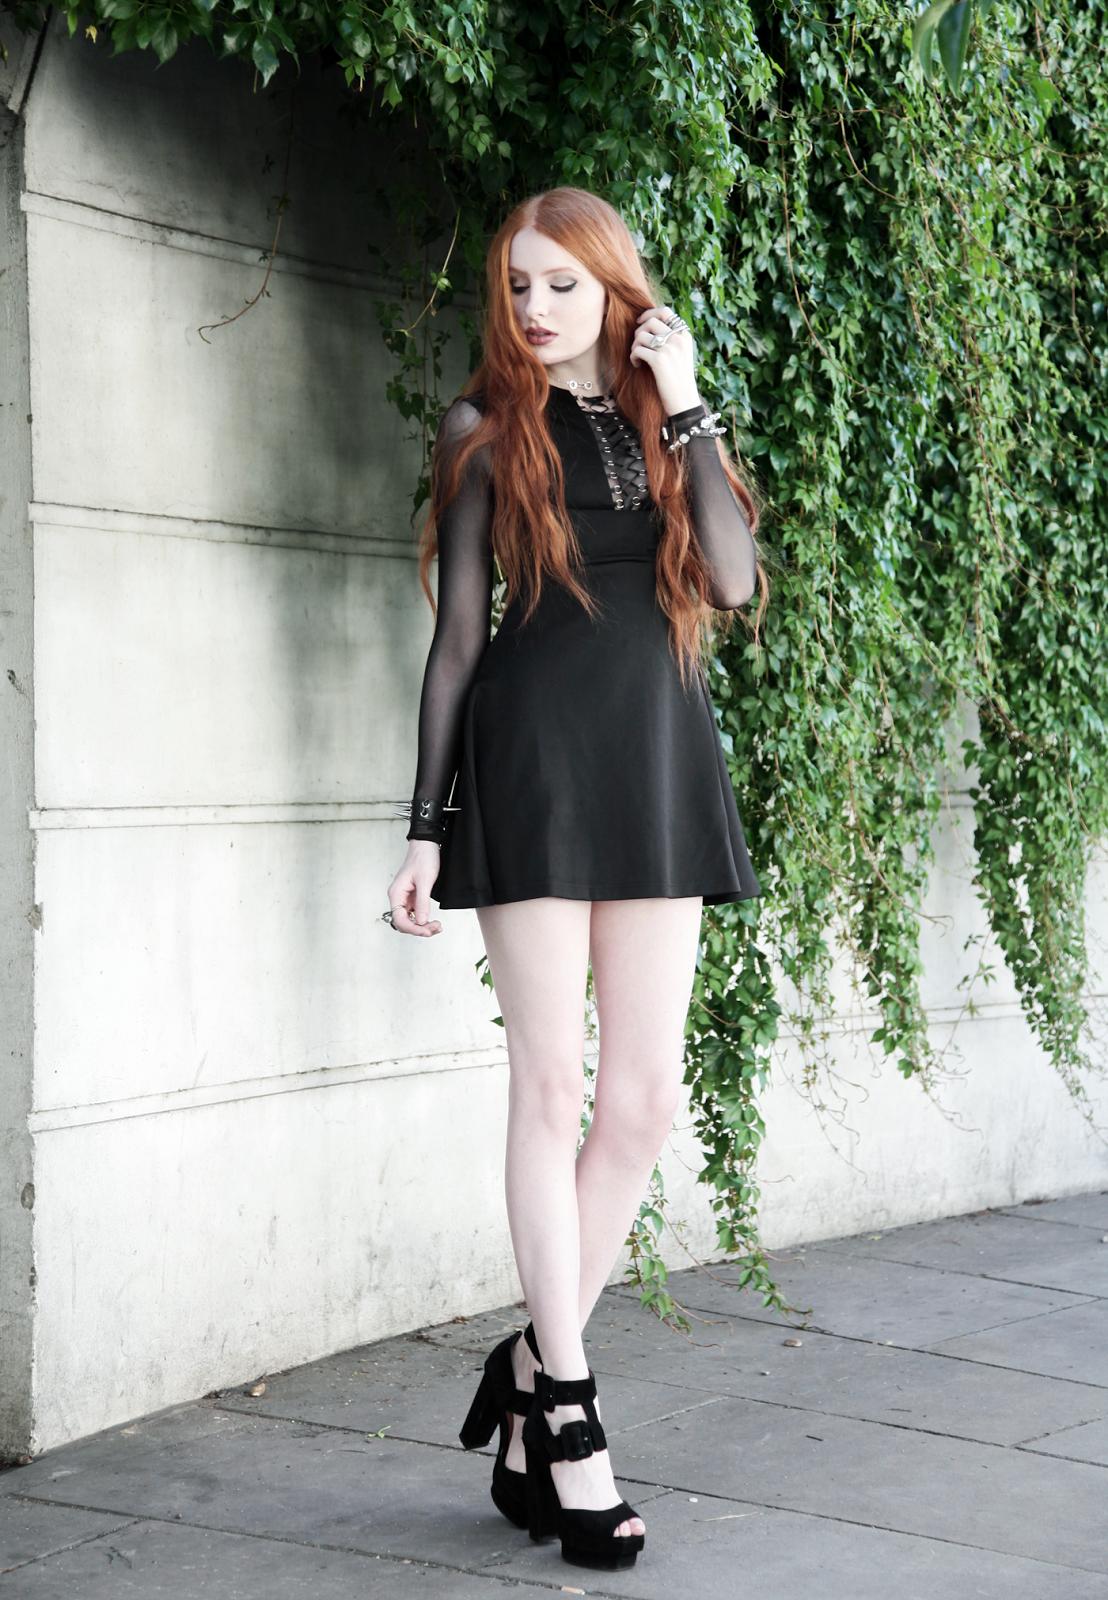 Olivia Emily - UK Fashion Blog : Cinch  in 2019 | Fashion